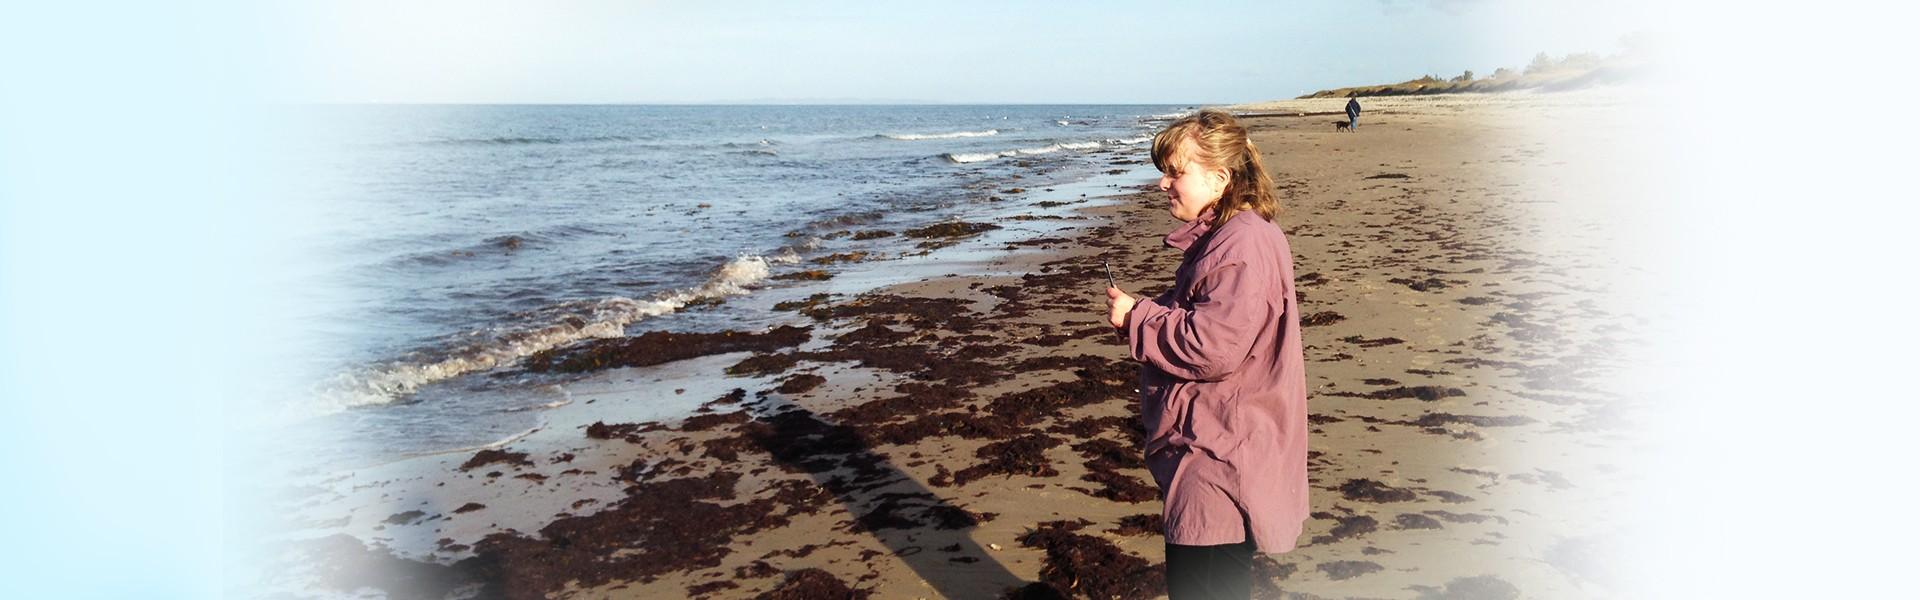 Dagtilbuddet Damsgaarden, strand baggrund